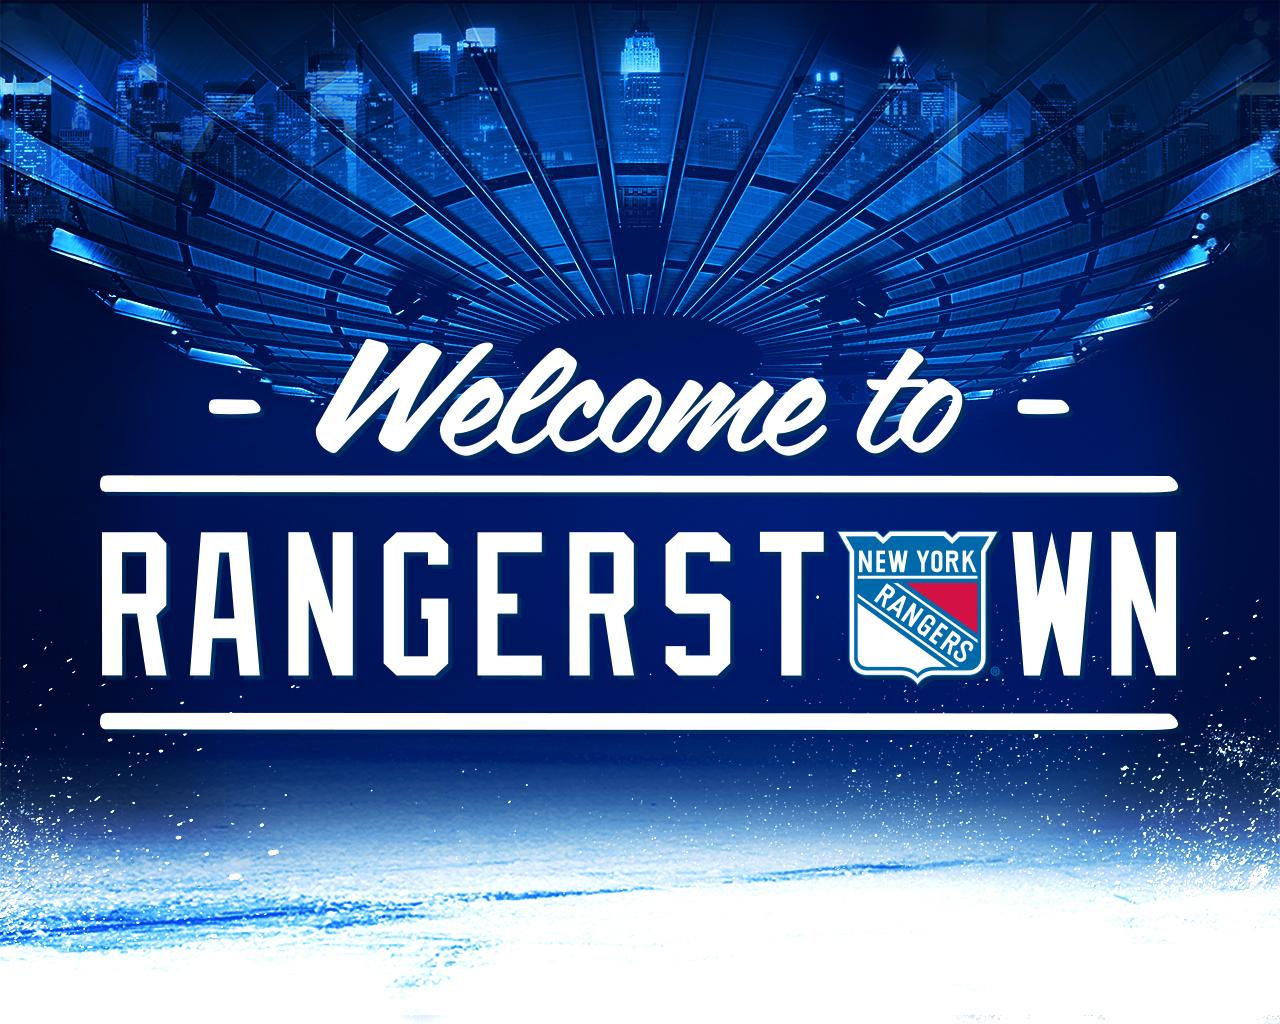 New York Rangers wallpaper 1440x900 54068 1280x1024